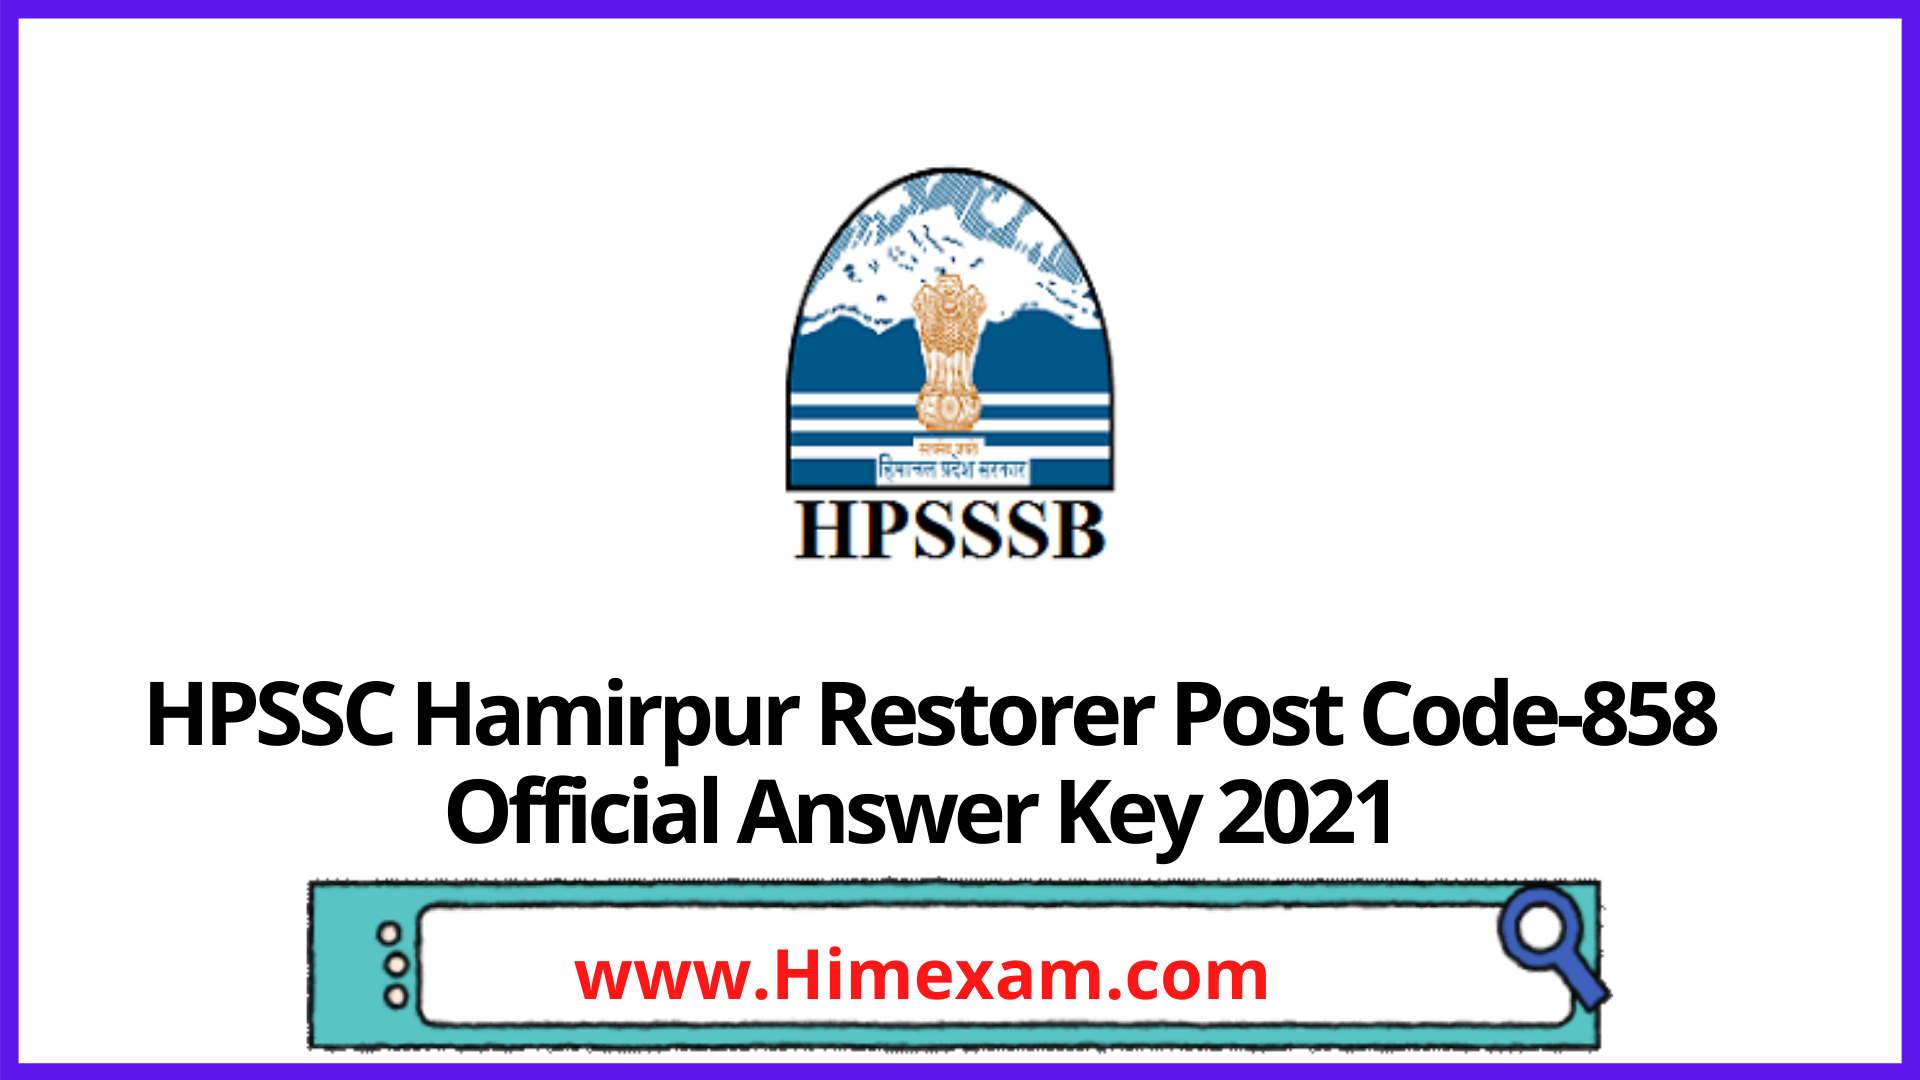 HPSSC Hamirpur Restorer Post Code-858 Official Answer Key 2021